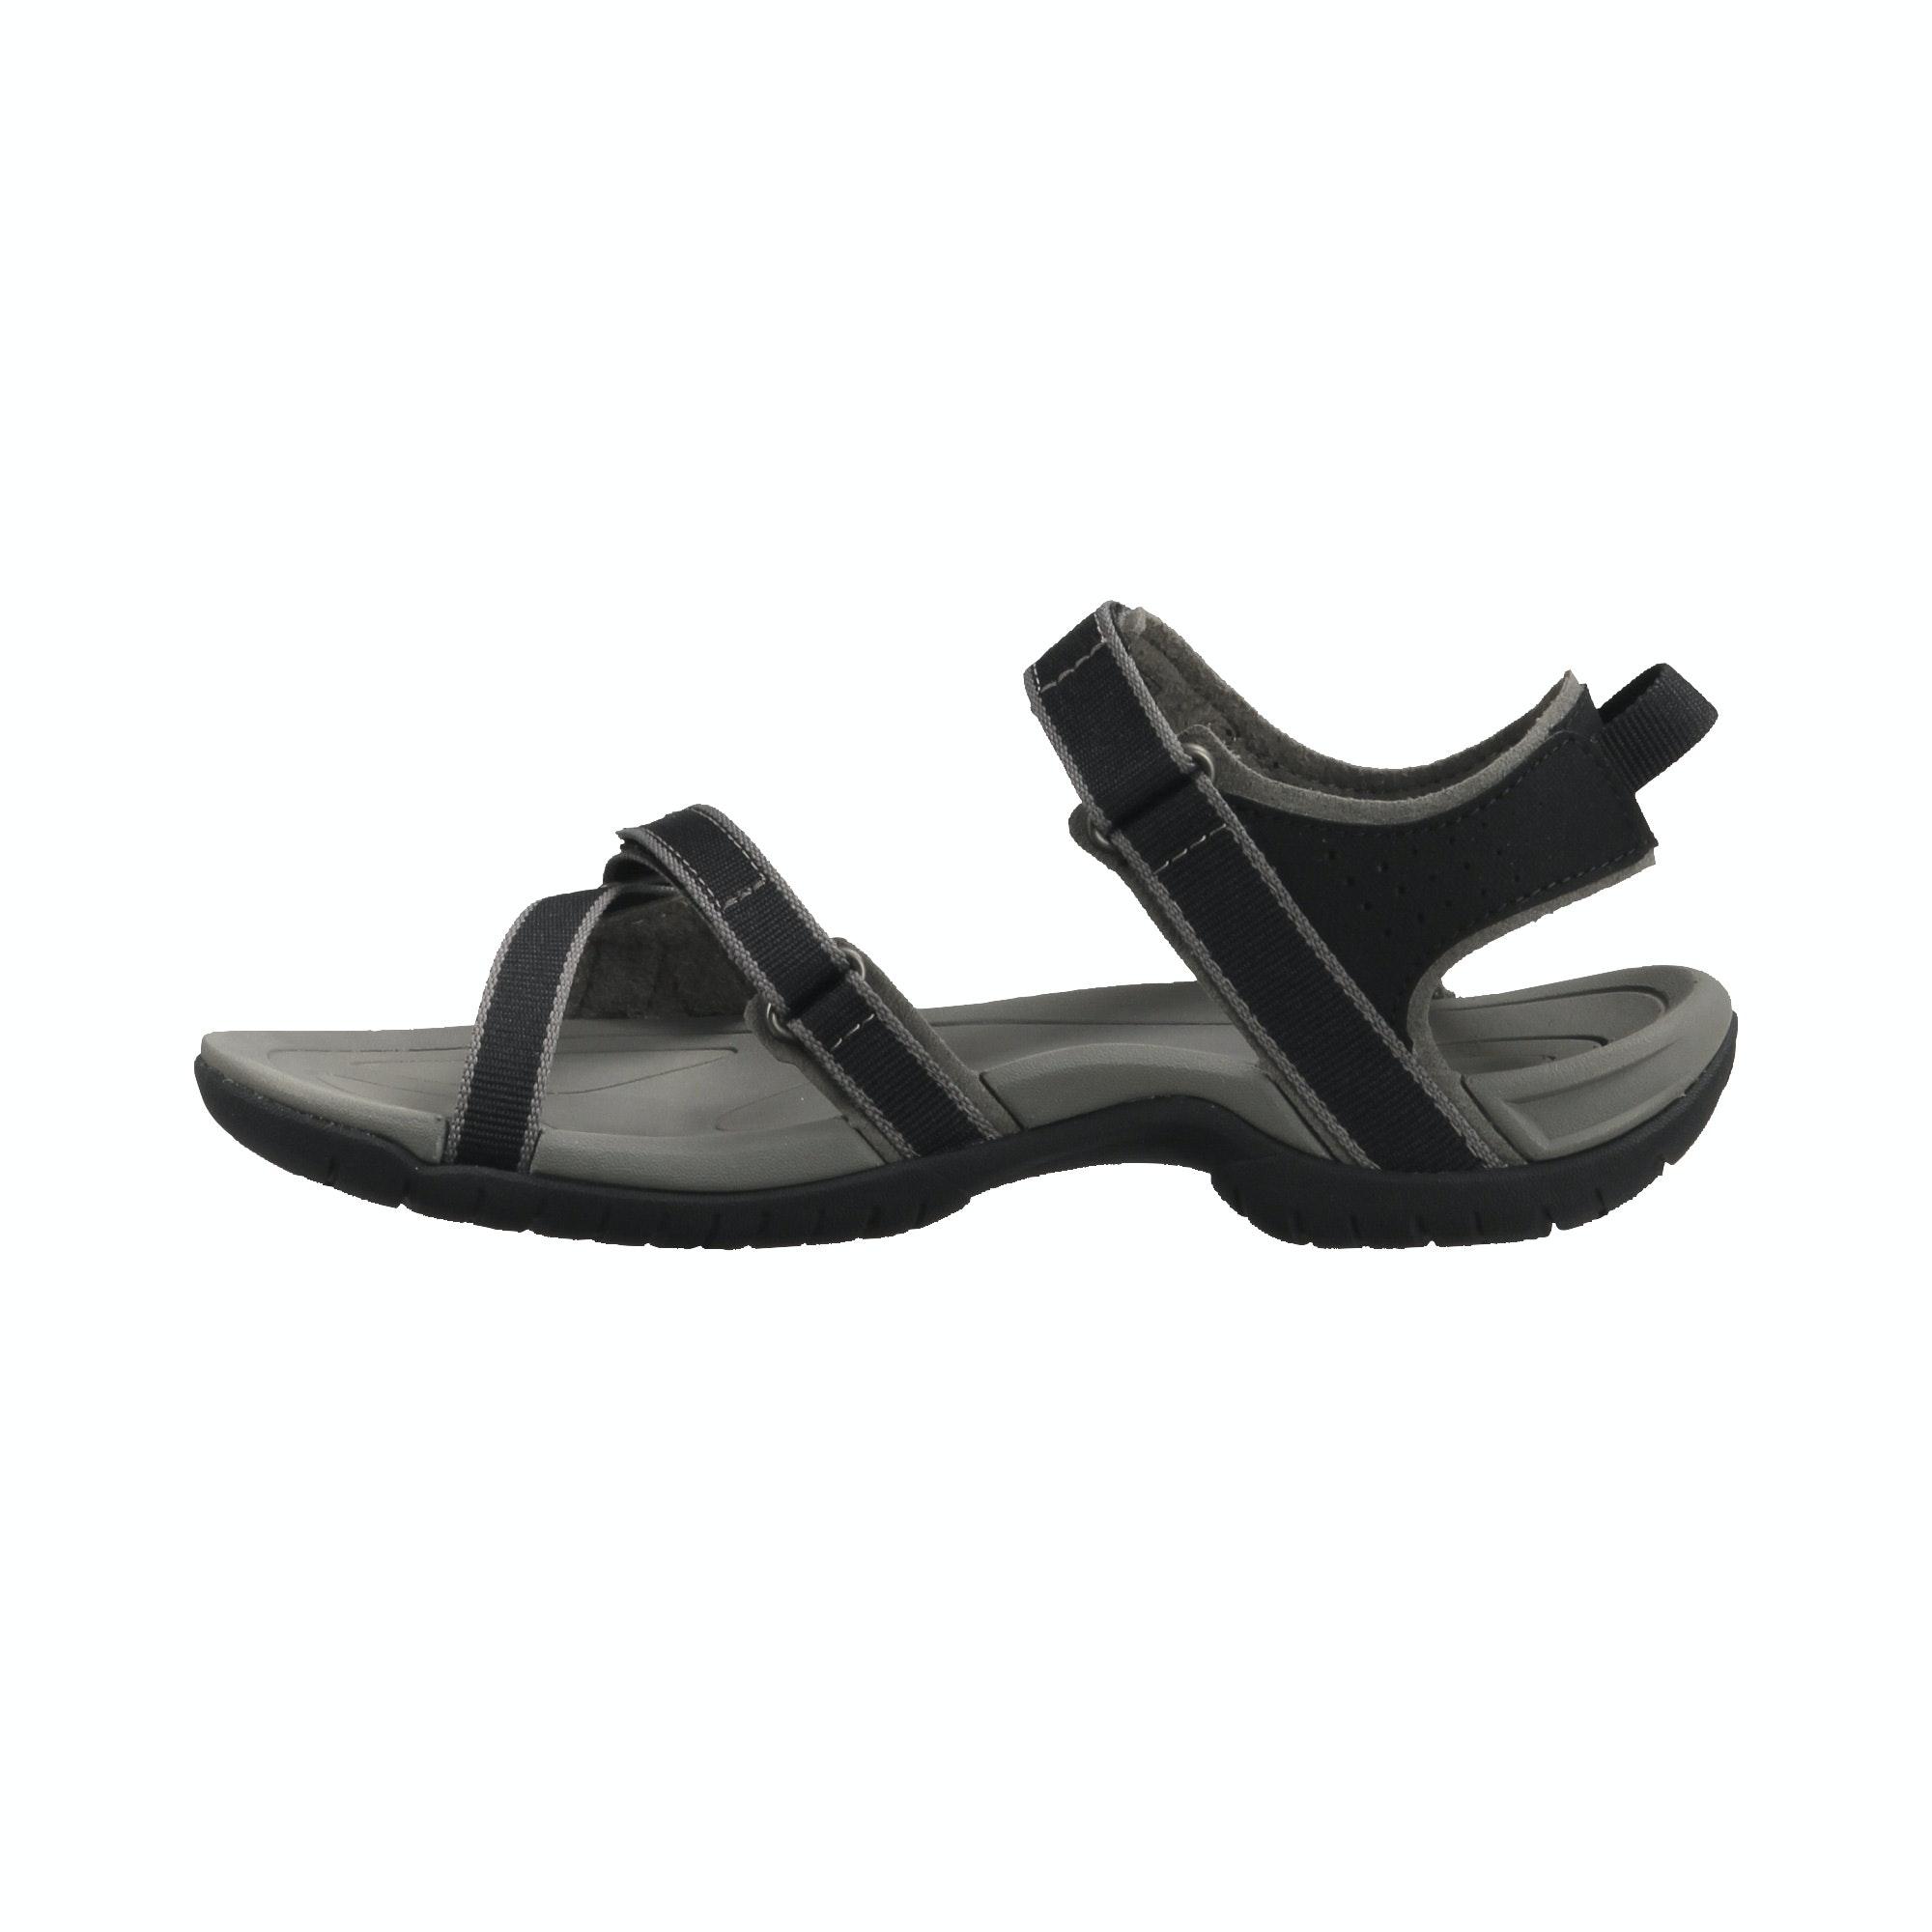 c9eeb6d05ae8 Teva Verra Women s Sandals - Black